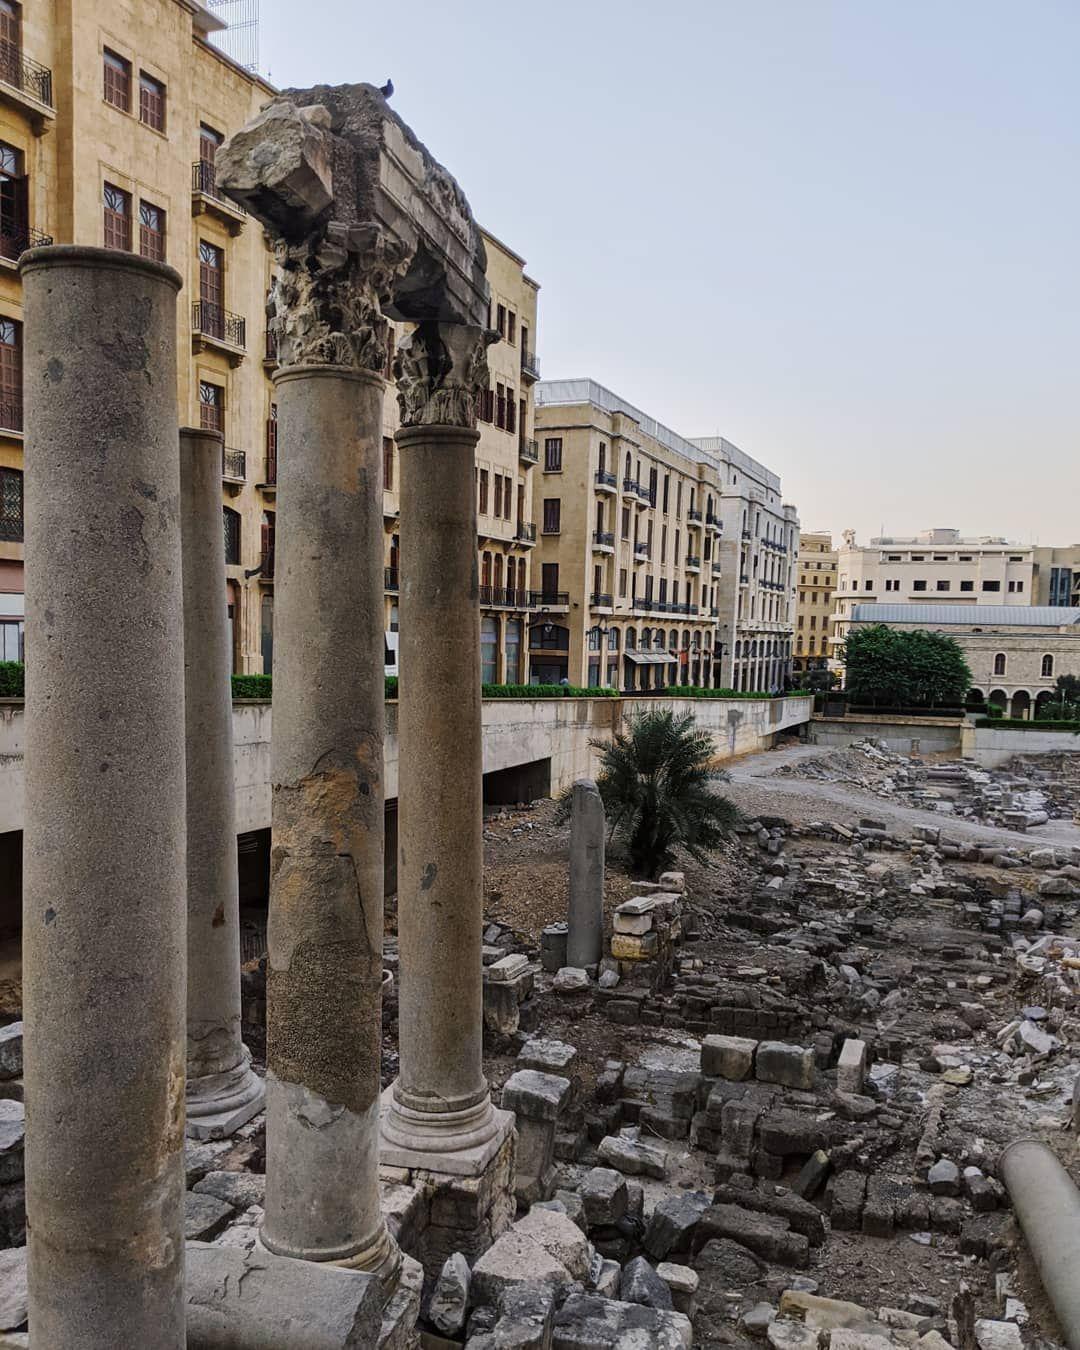 Roman Ruins Of Beirut Travel Beiruttravel Lebanon Romanruins Doingittheelinaway Travellebanon Leaning Tower Of Pisa Ruins Travel